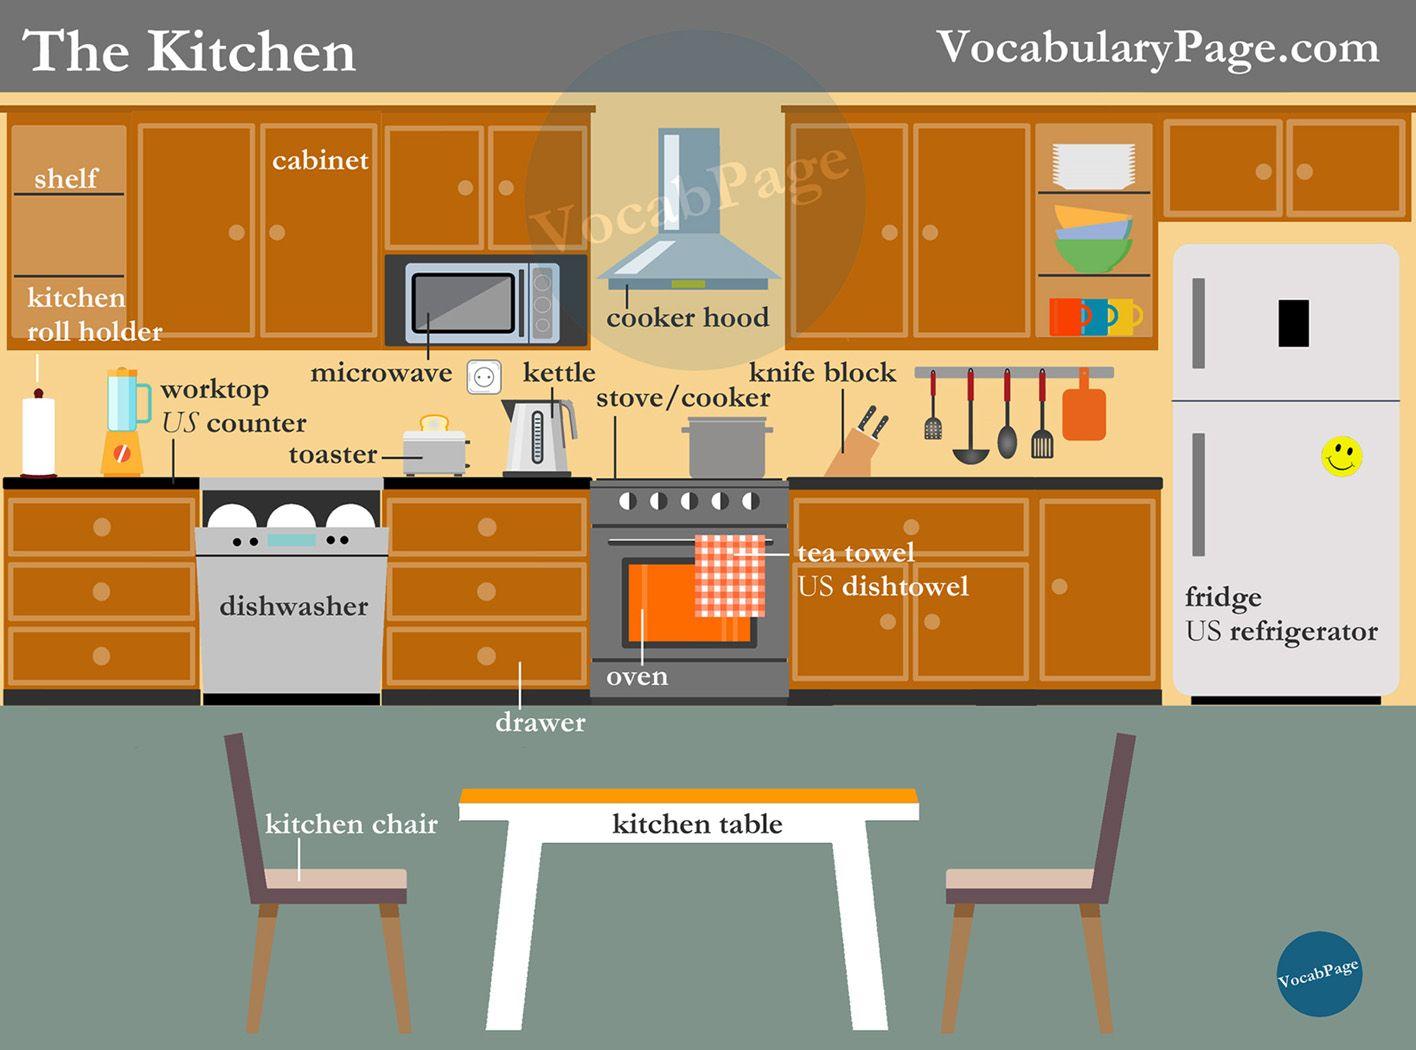 Home Office Bedroom Ideas Vocabularypage Kitchen Vocabulary Англійська Pinterest